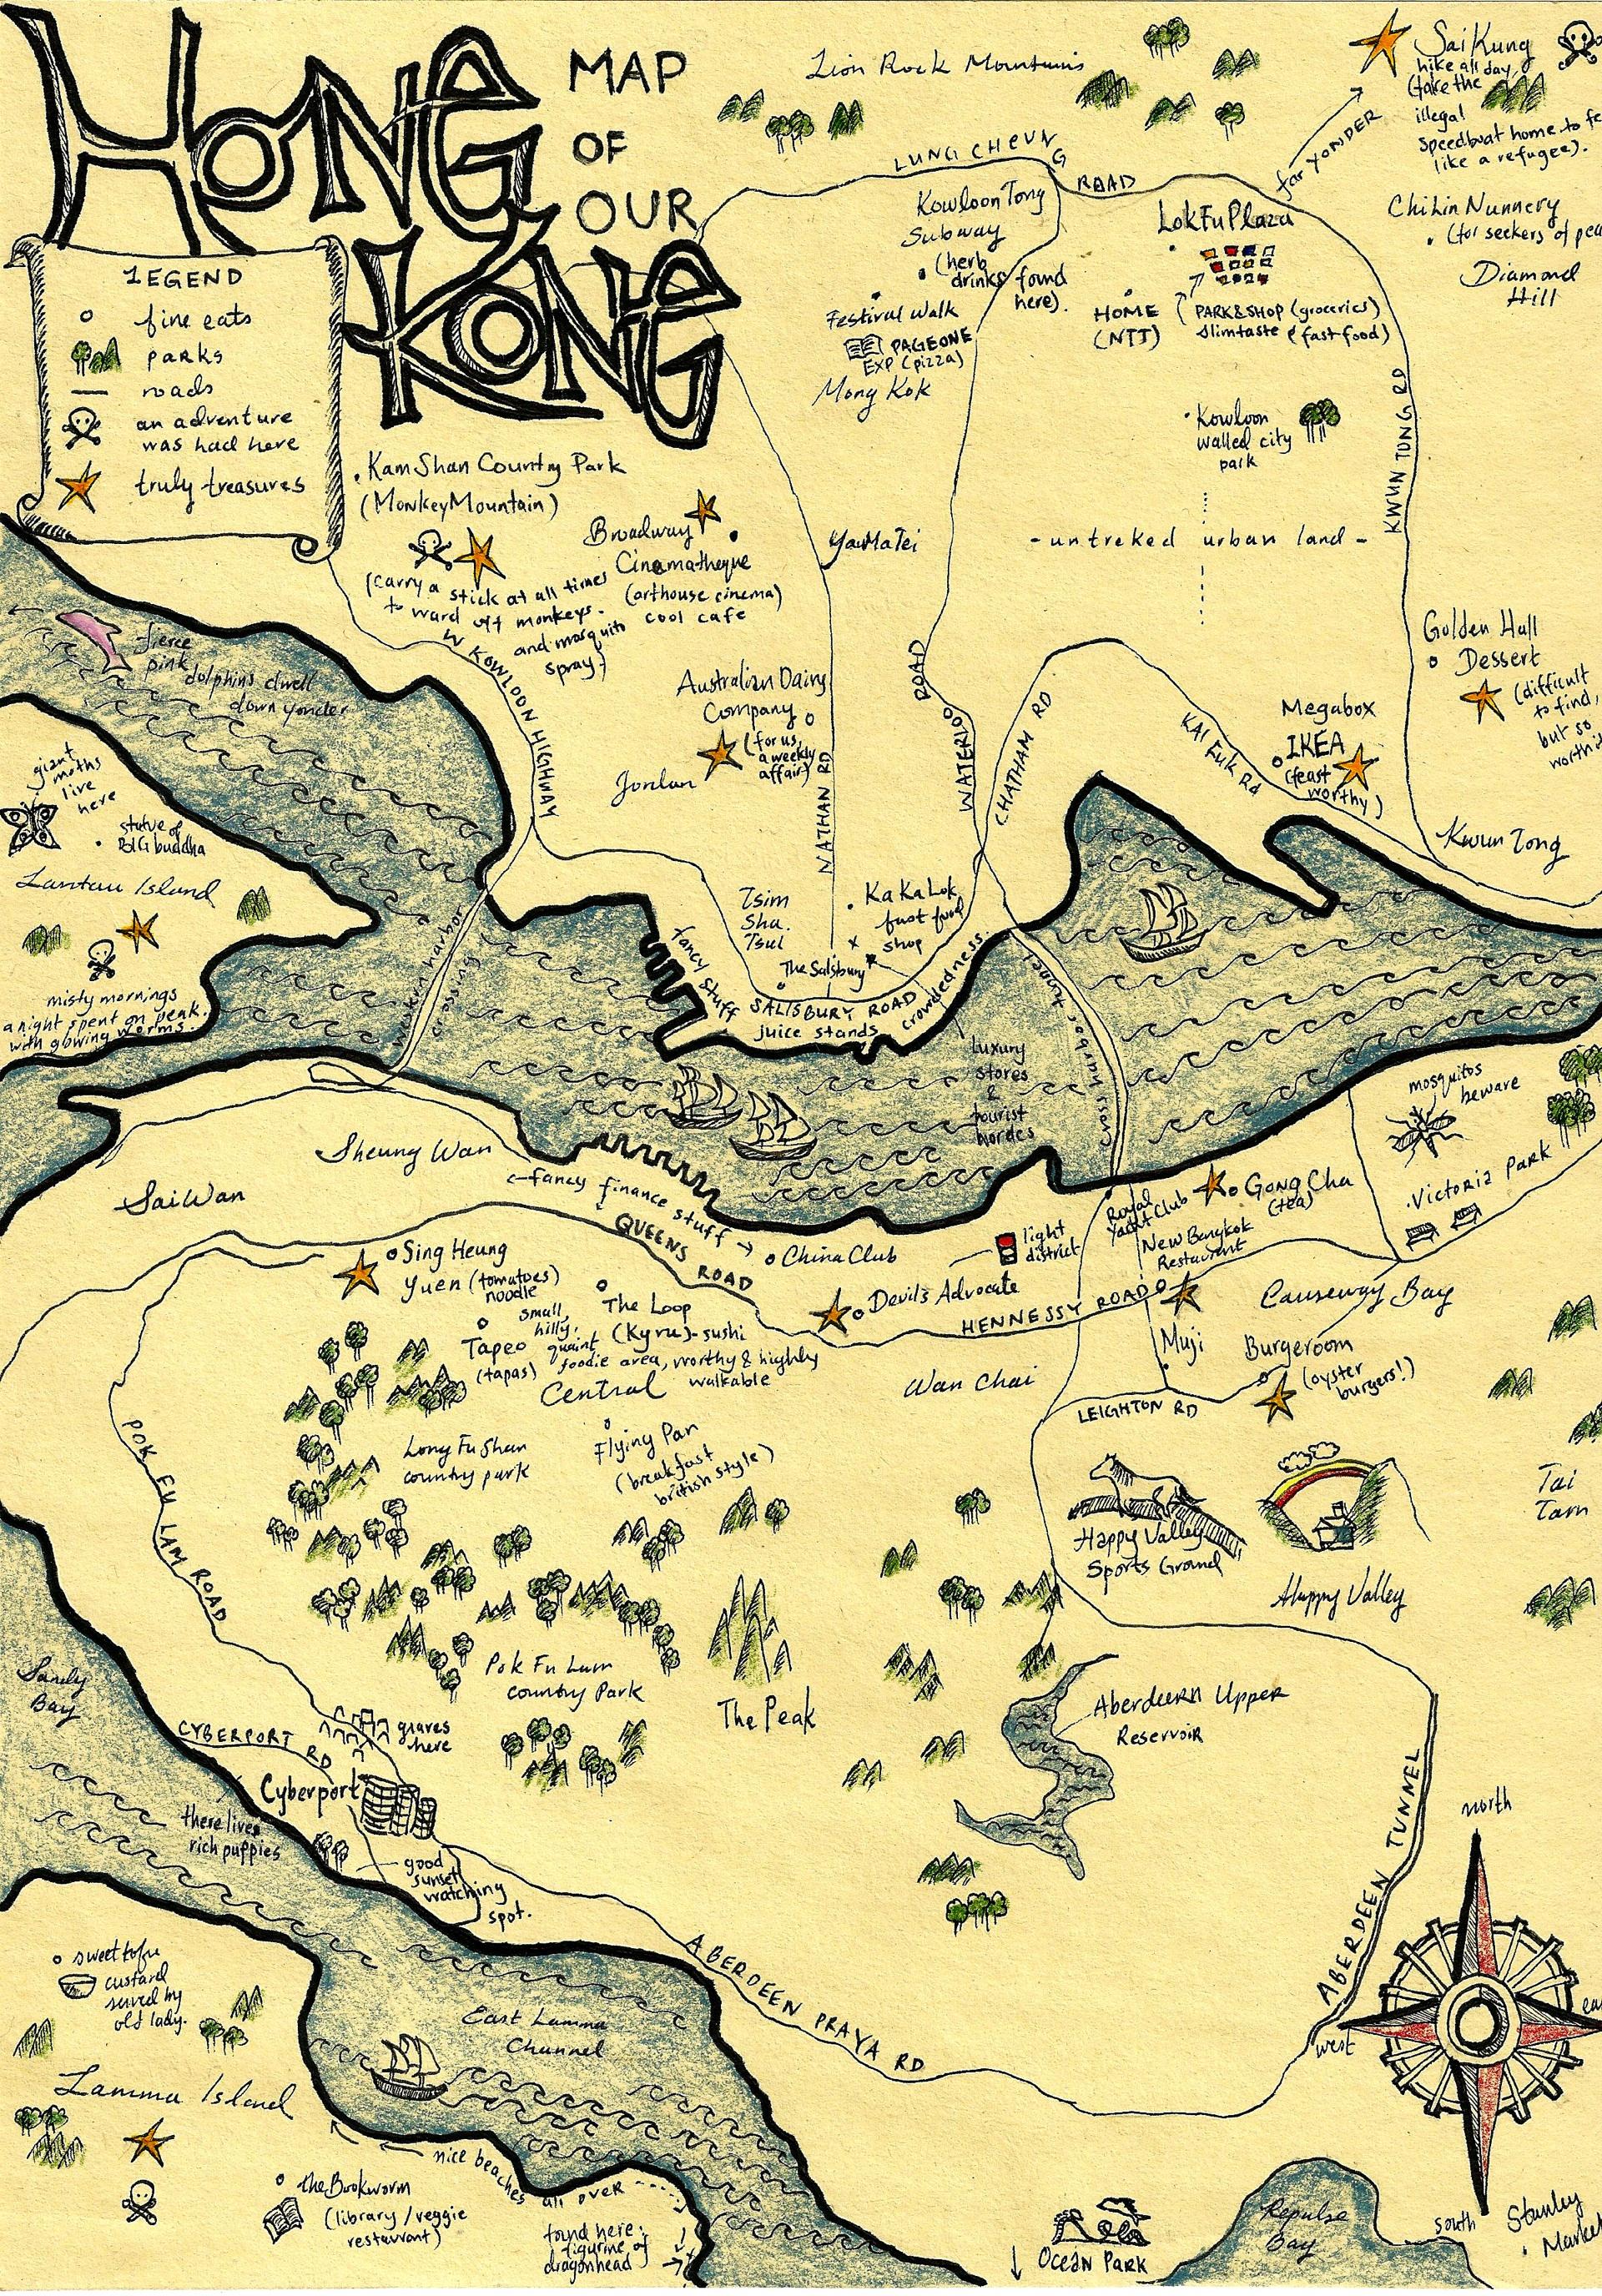 hong kong mapped by kening, 2013